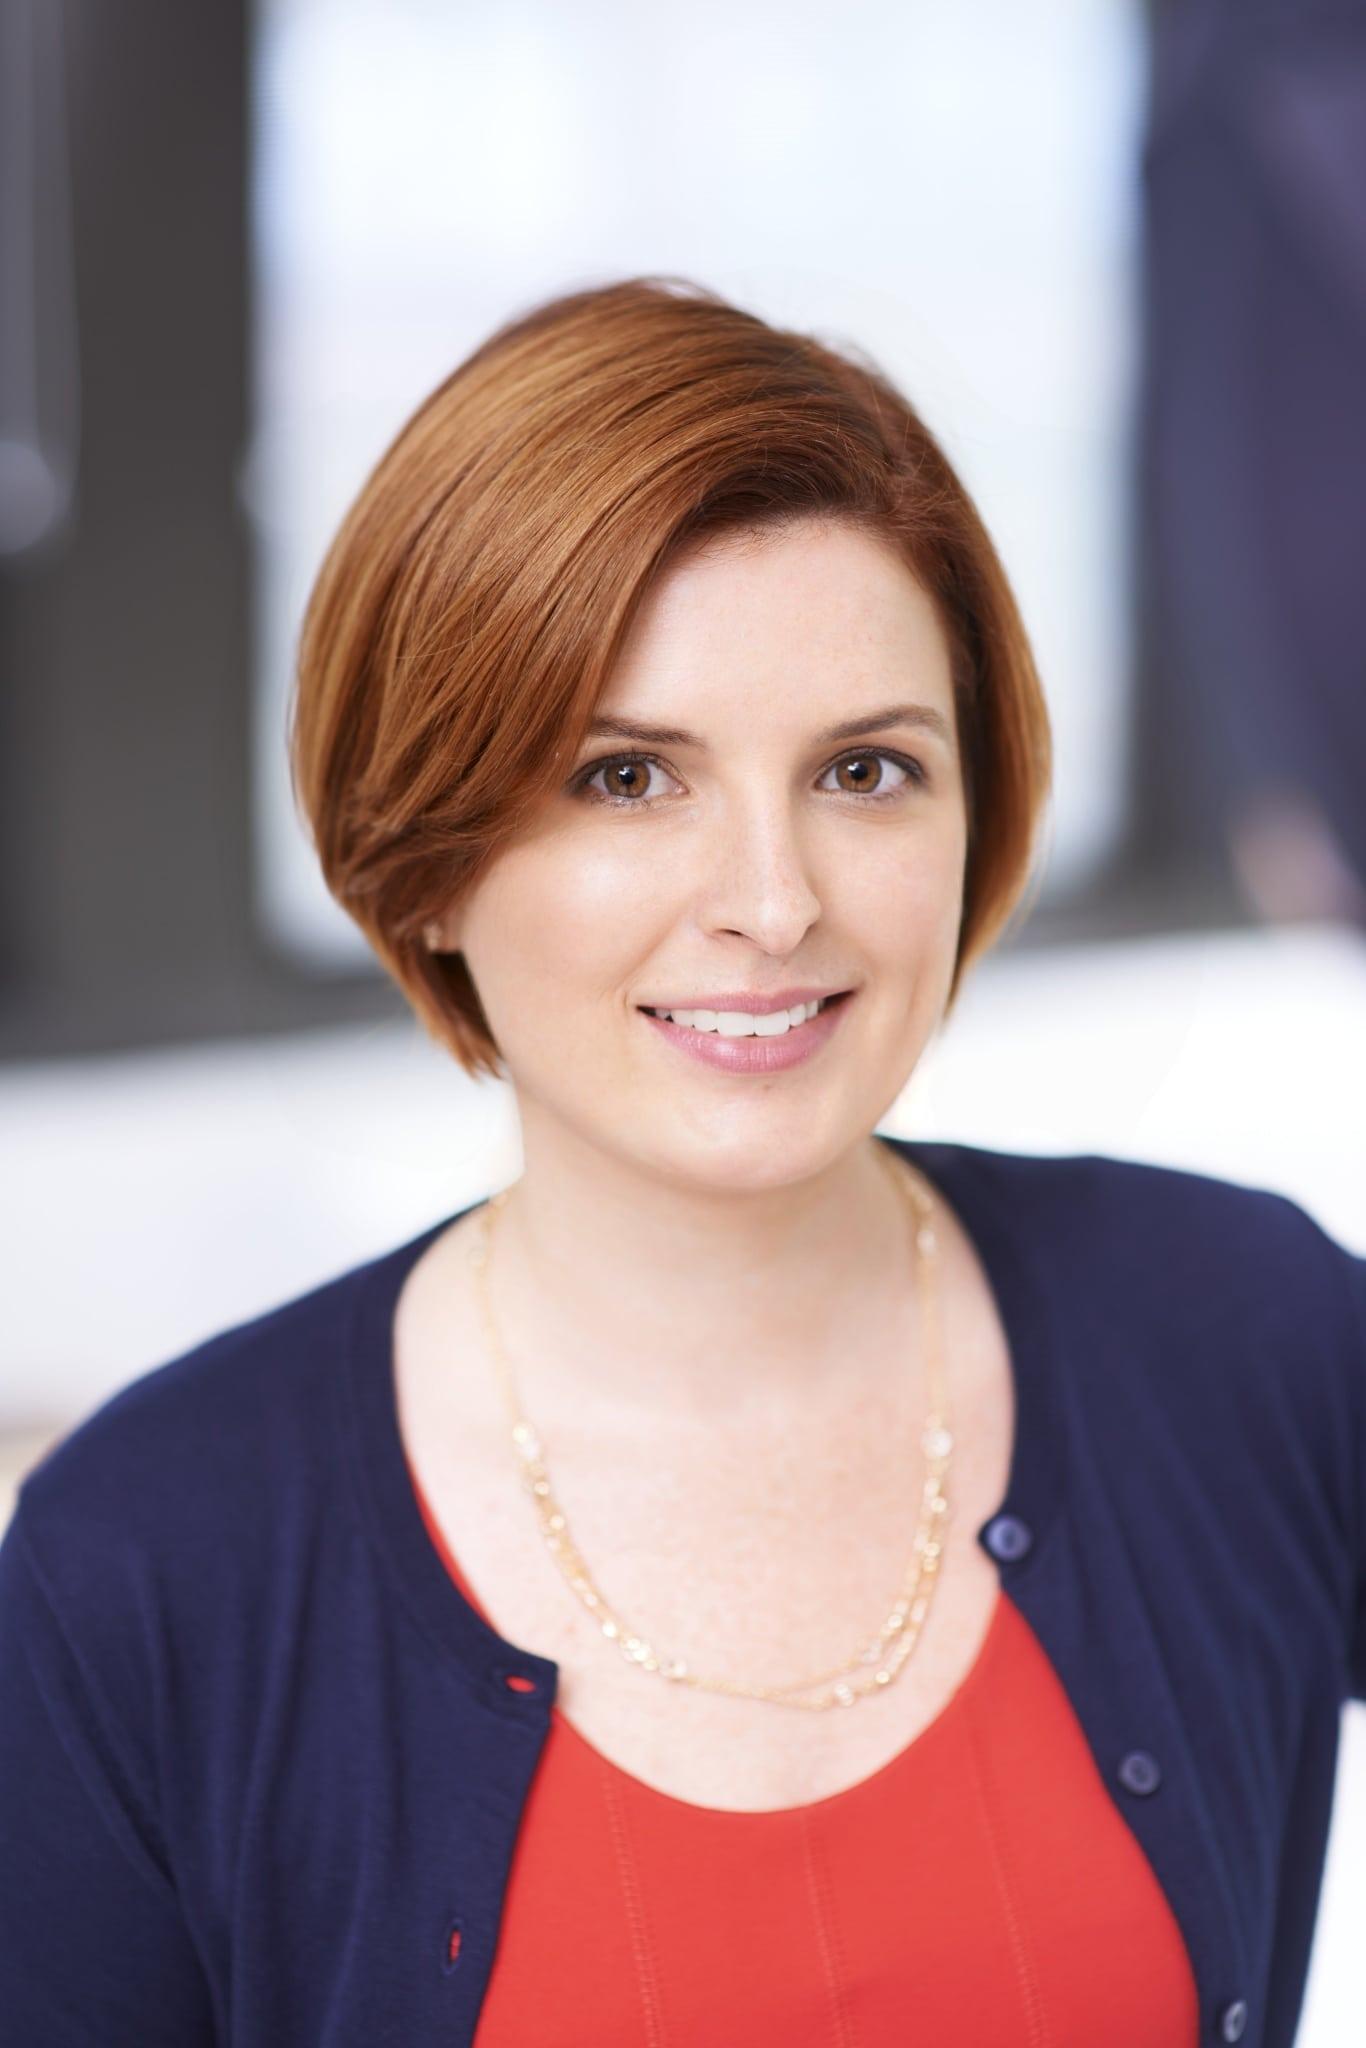 Tara Welty